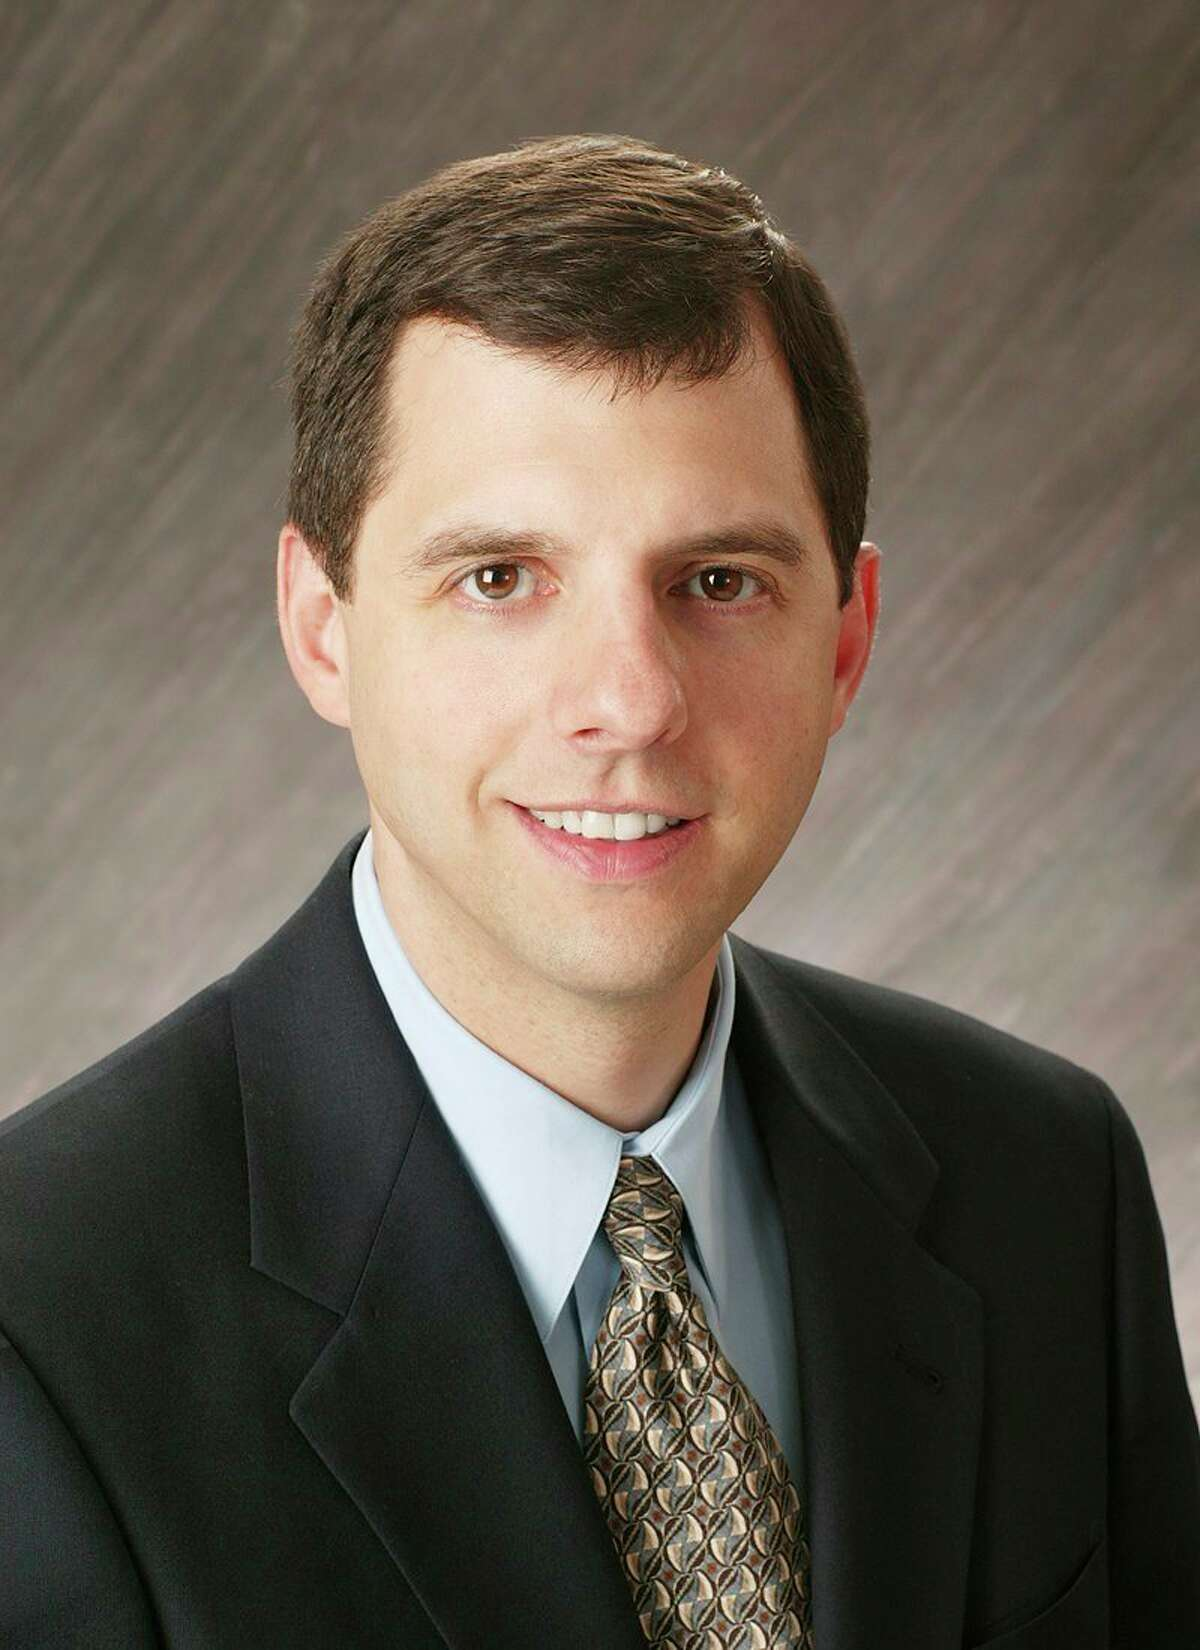 Michael Nizzi